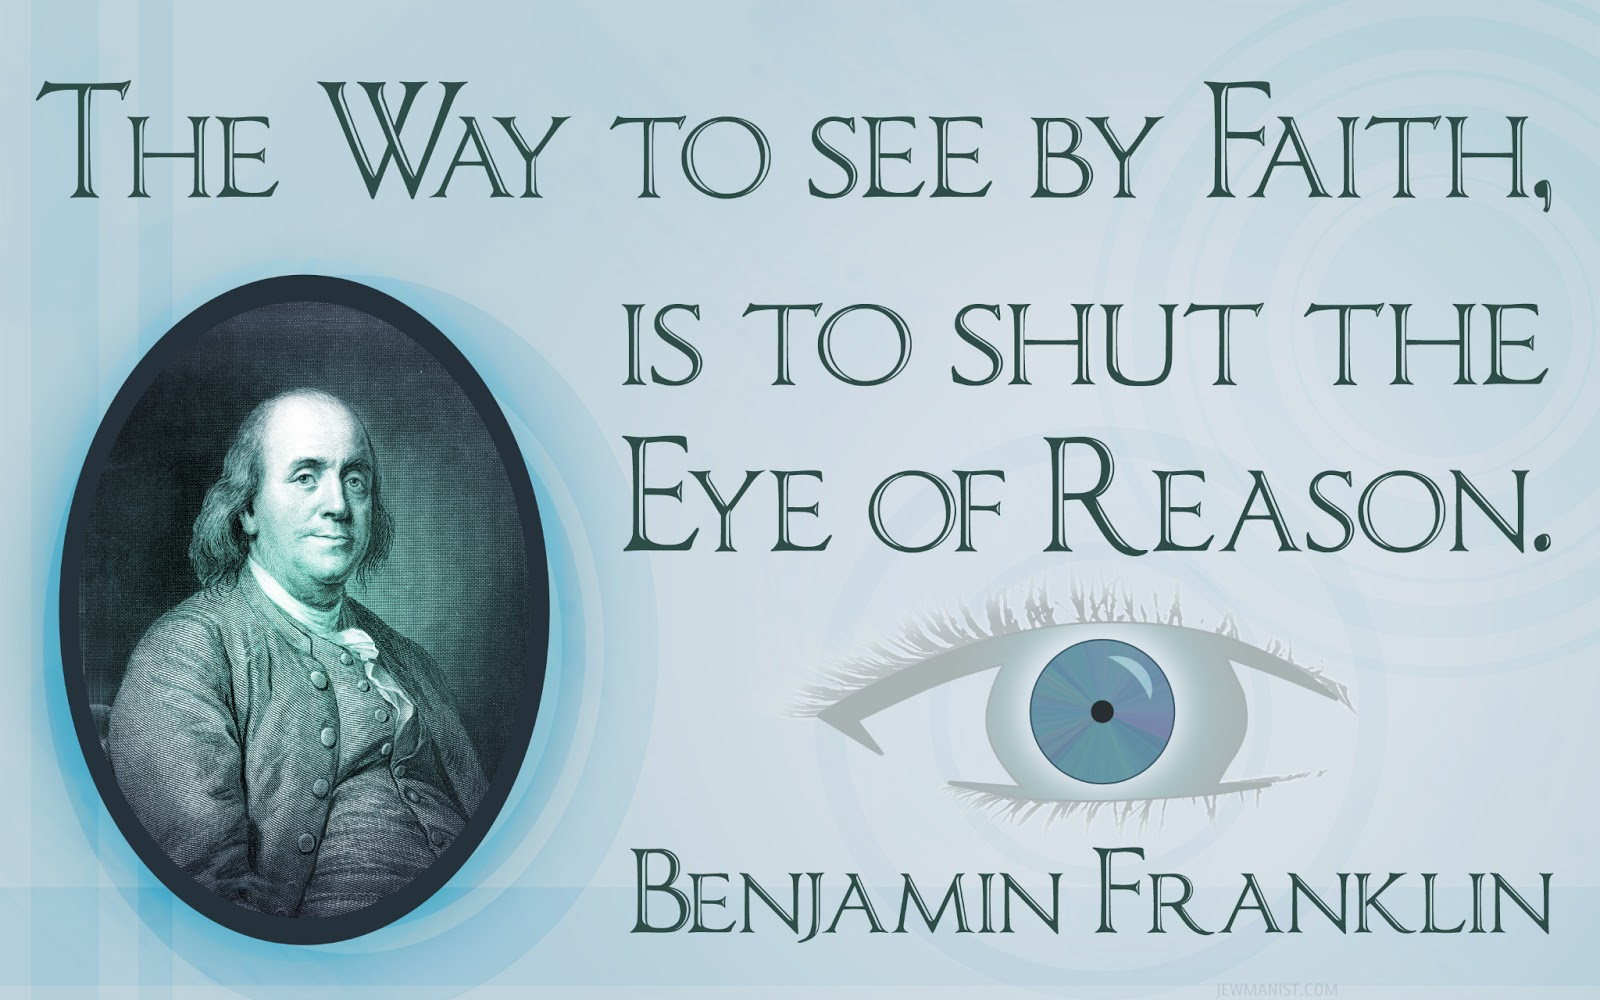 Benjamin-Franklin-Faith-and-Reason-wallpaper